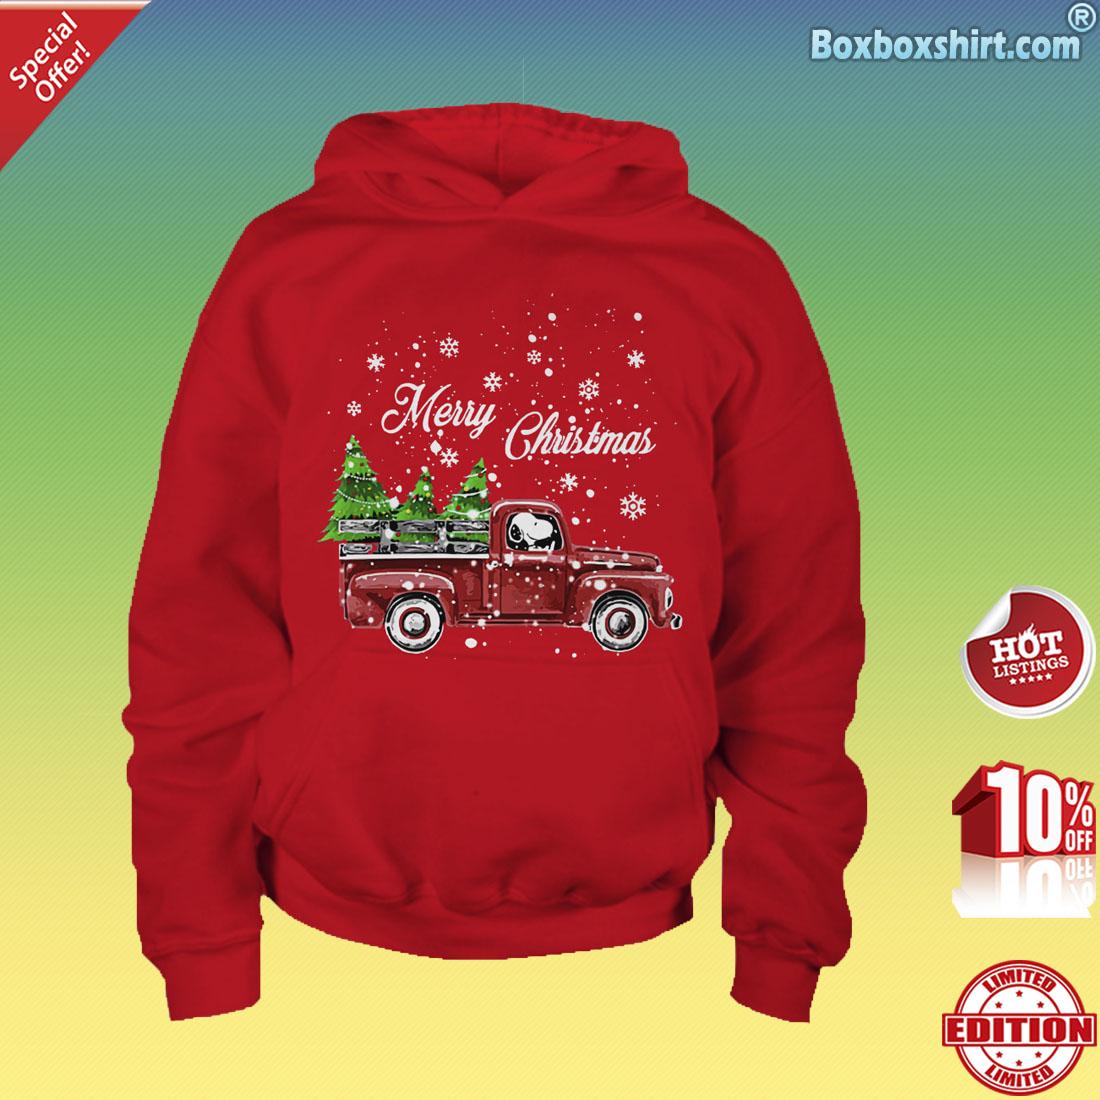 Merry Christmas snoopy drives car shirt